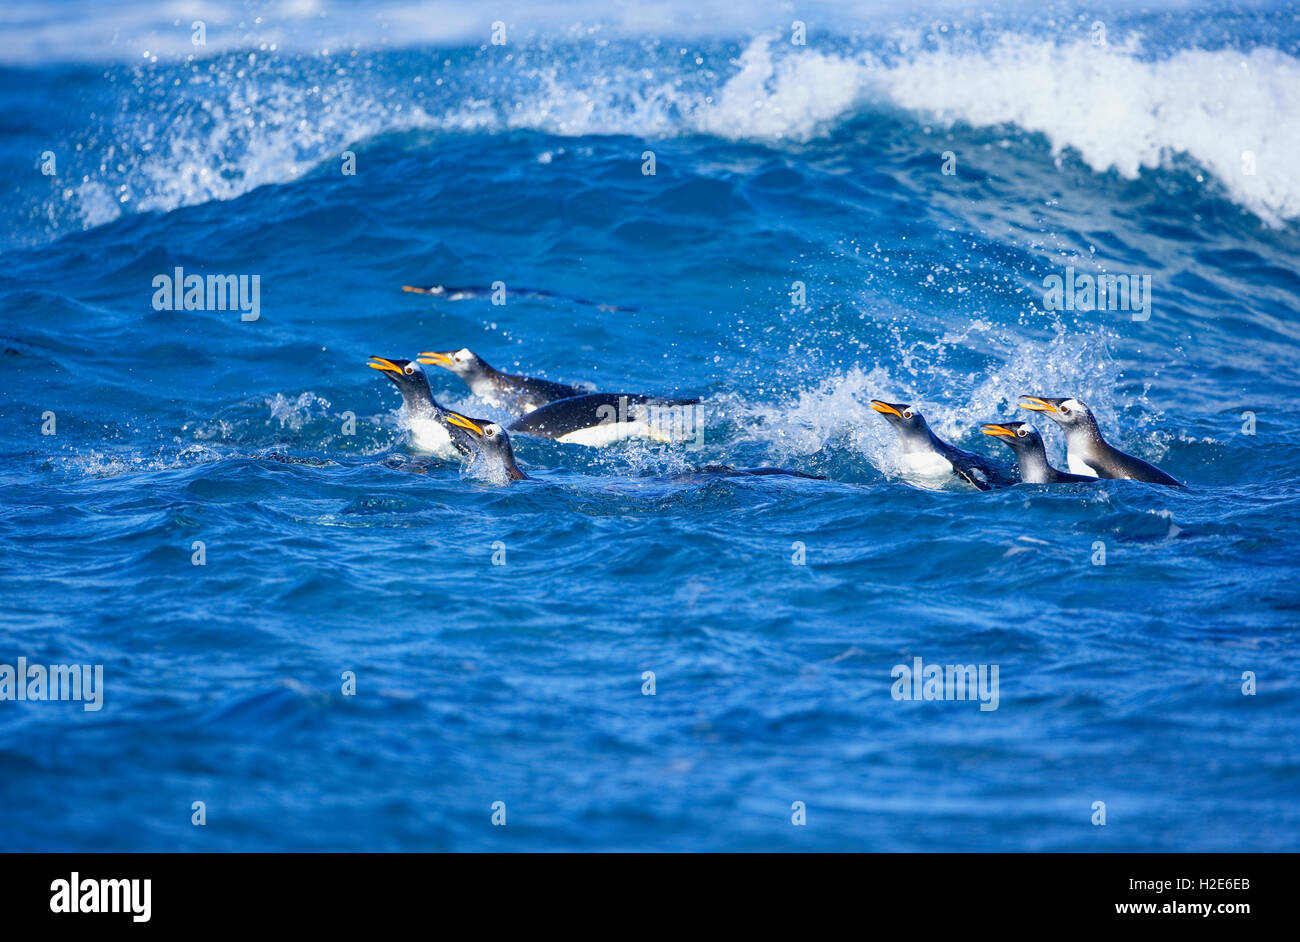 Gentoo Penguins (Pygoscelis papua papua), colony swimming together, Falkland Islands,South Atlantic - Stock Image